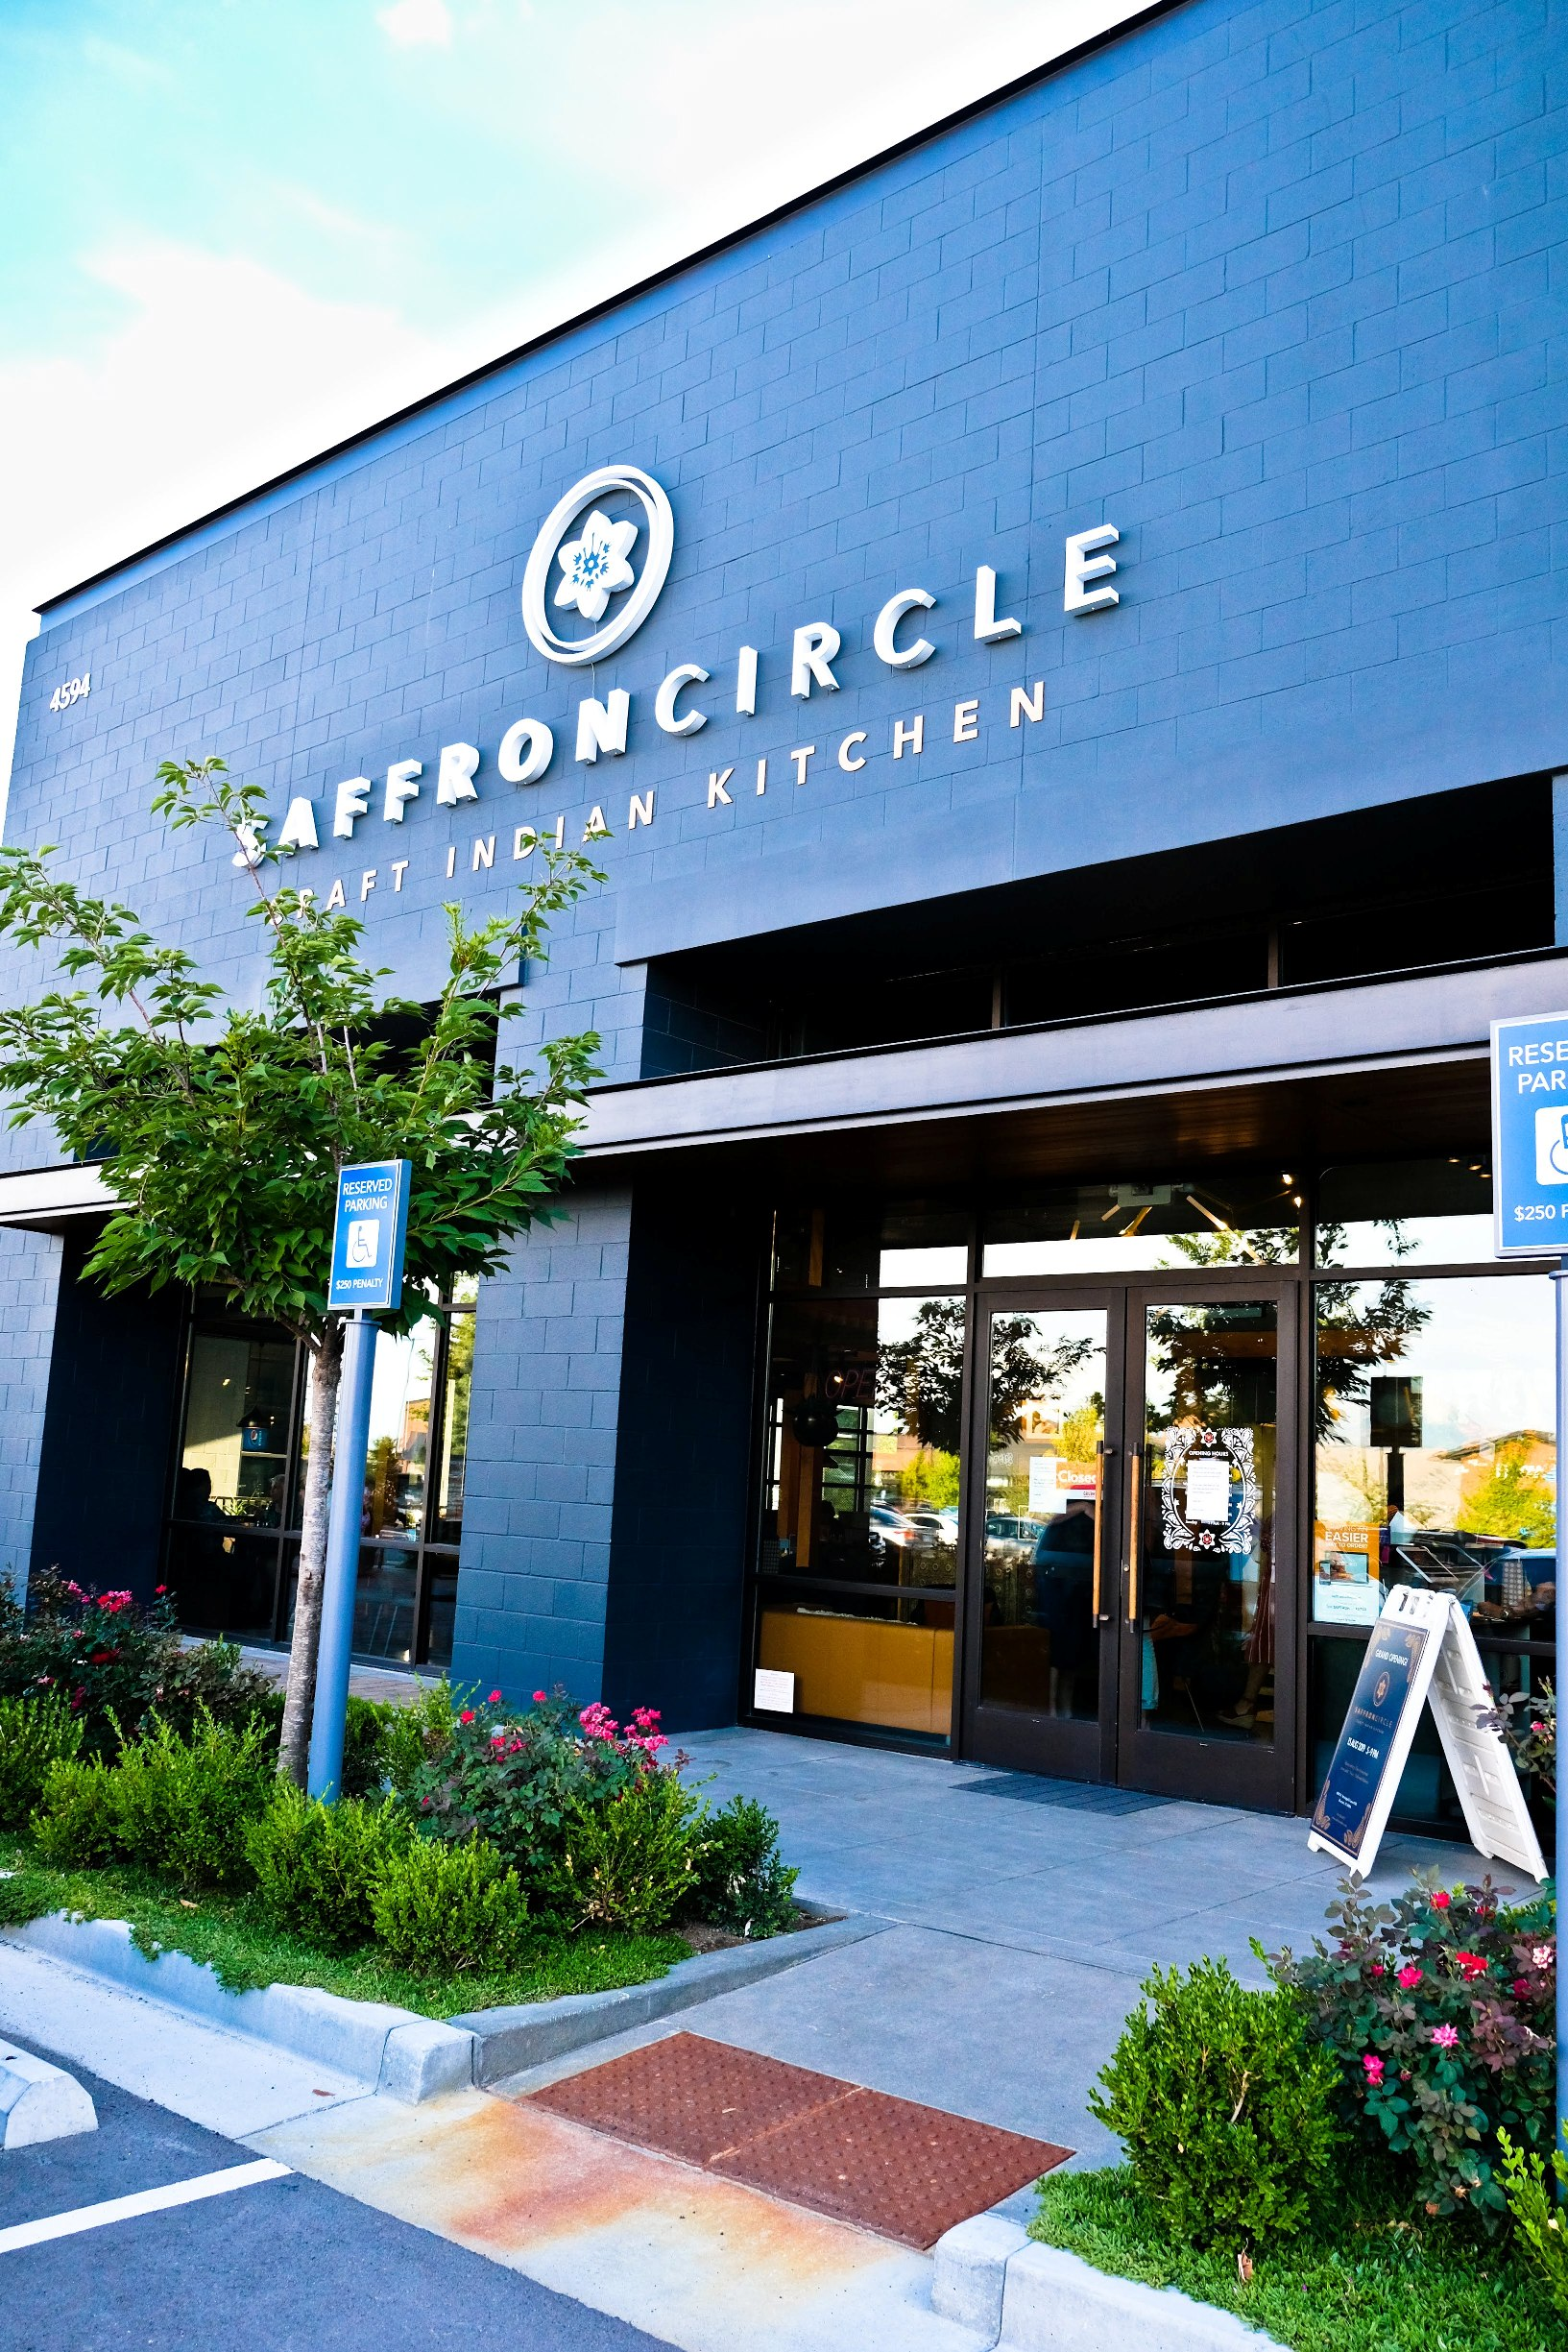 Saffron Circle in Riverton, UT